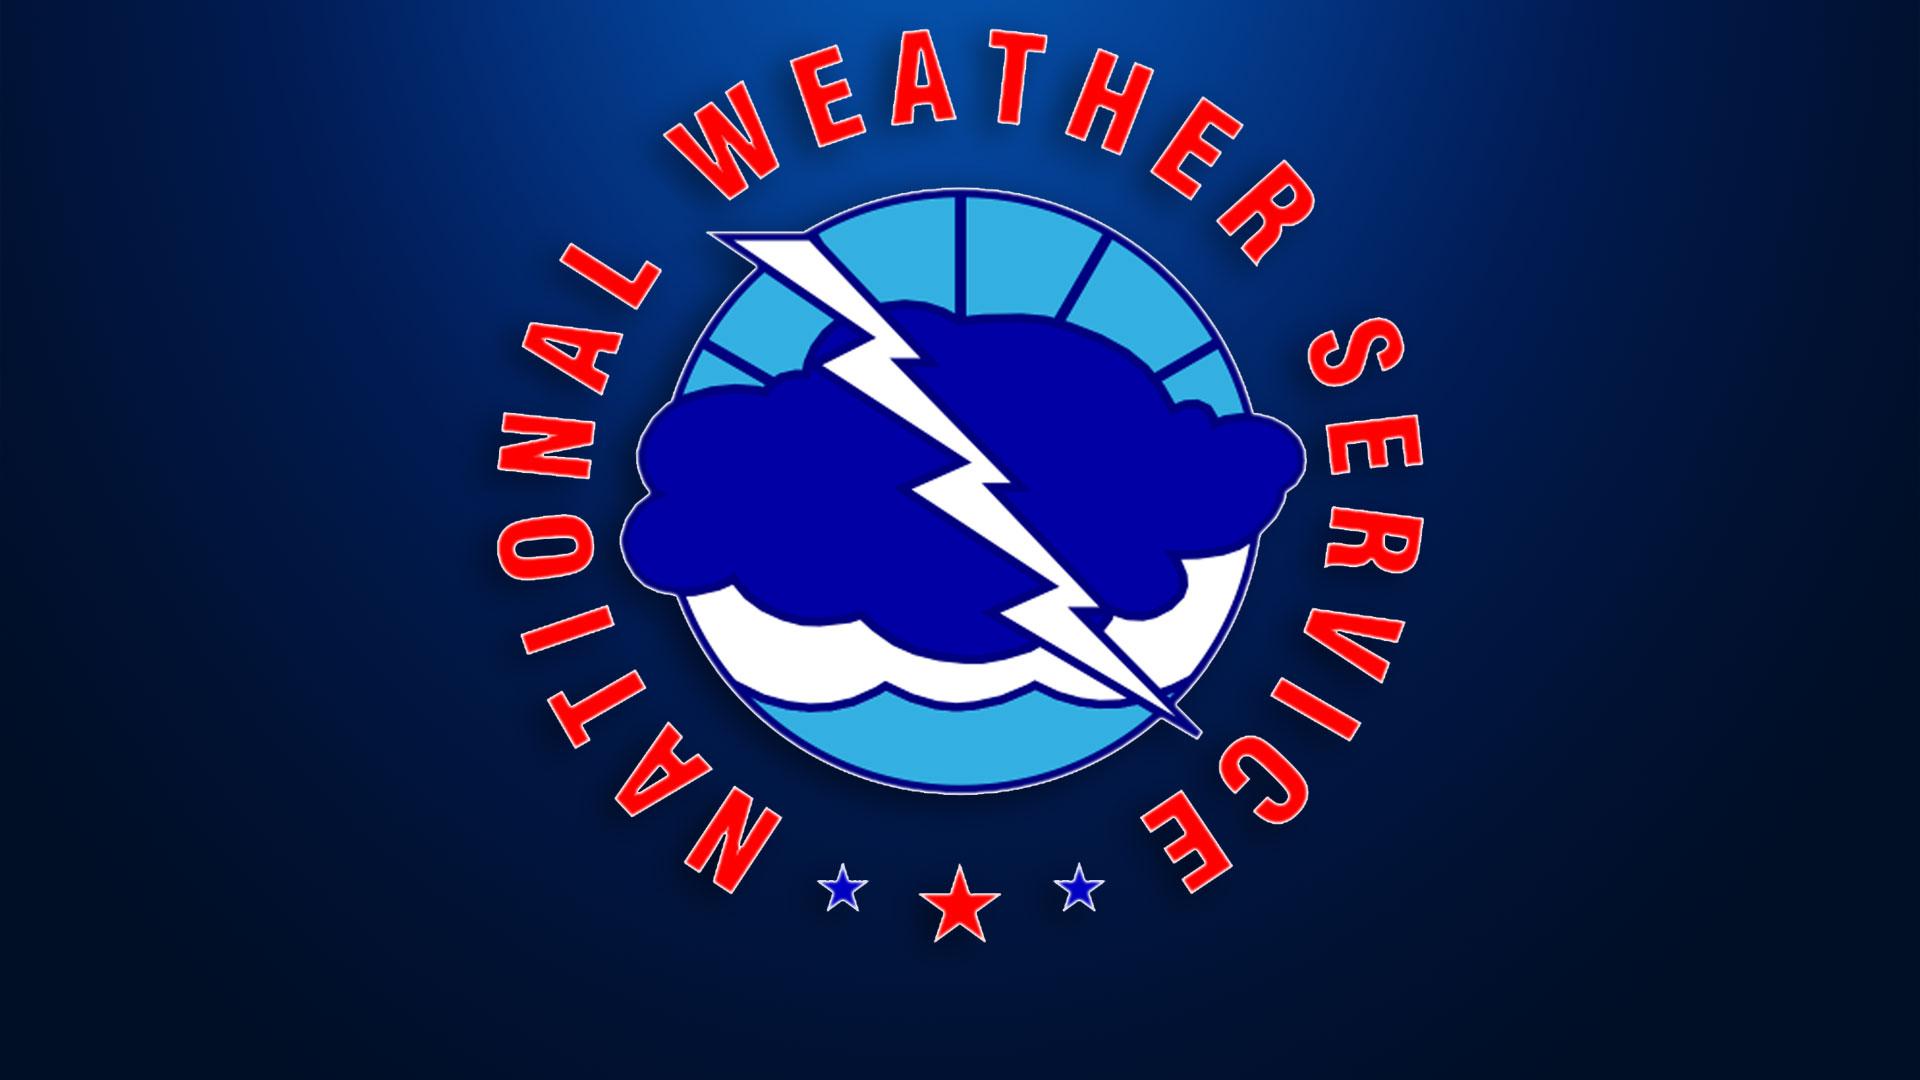 KELO National Weather Service logo